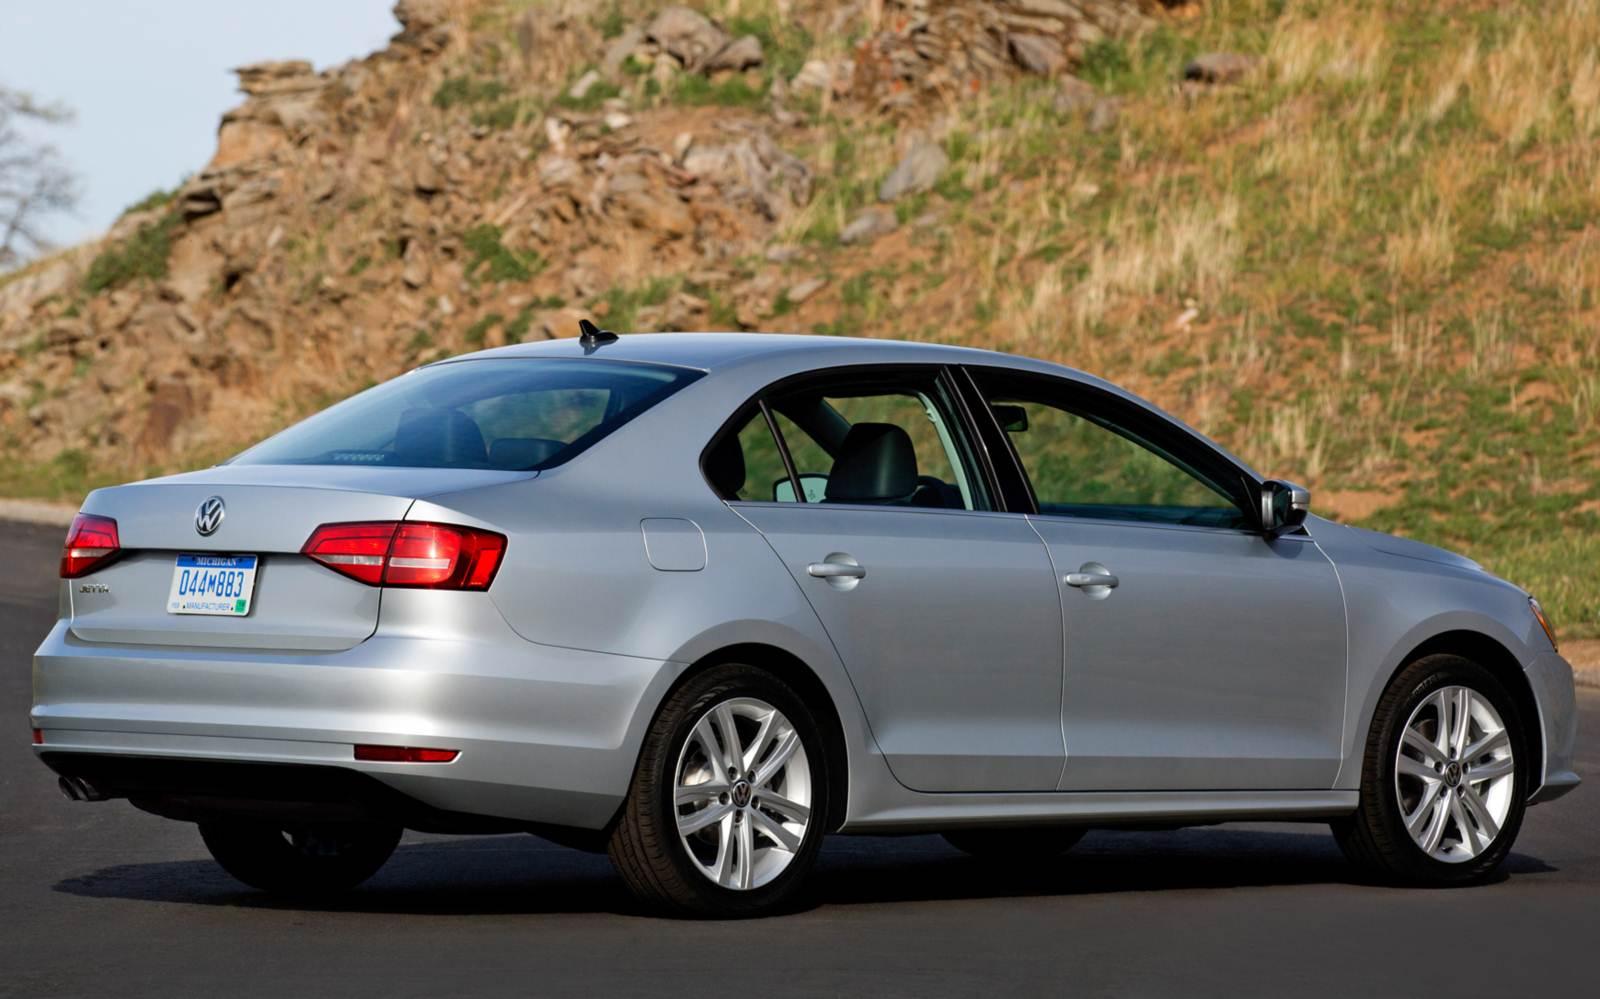 Novo Volkswagen Jetta 2015 - traseira